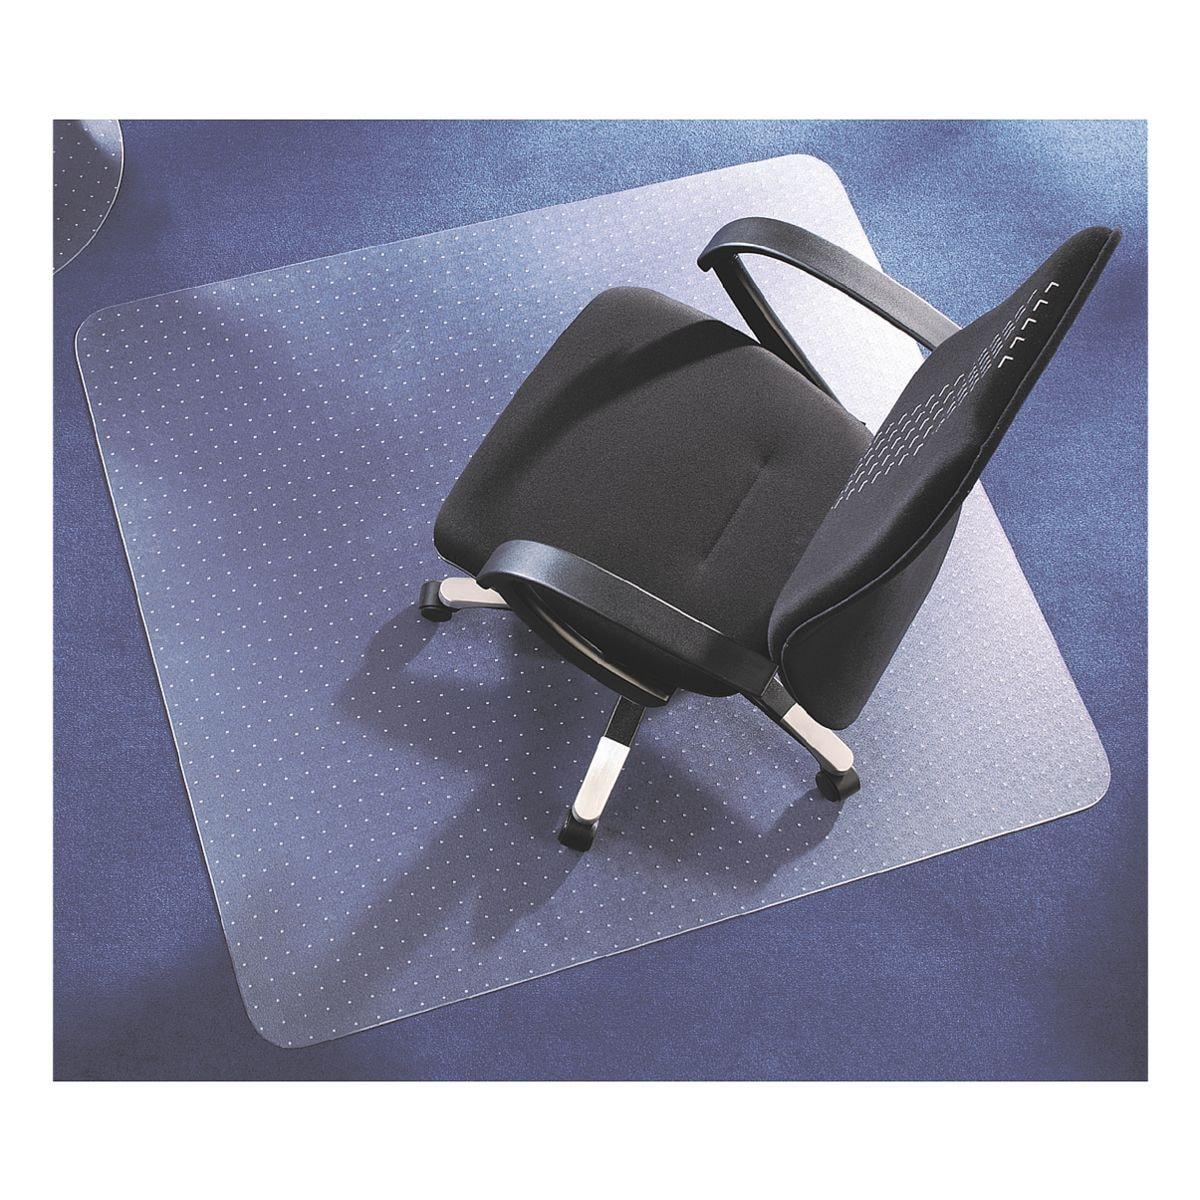 bodenschutzmatte f r teppichb den polycarbonat rechteck 120 x 150 cm otto office bei otto. Black Bedroom Furniture Sets. Home Design Ideas